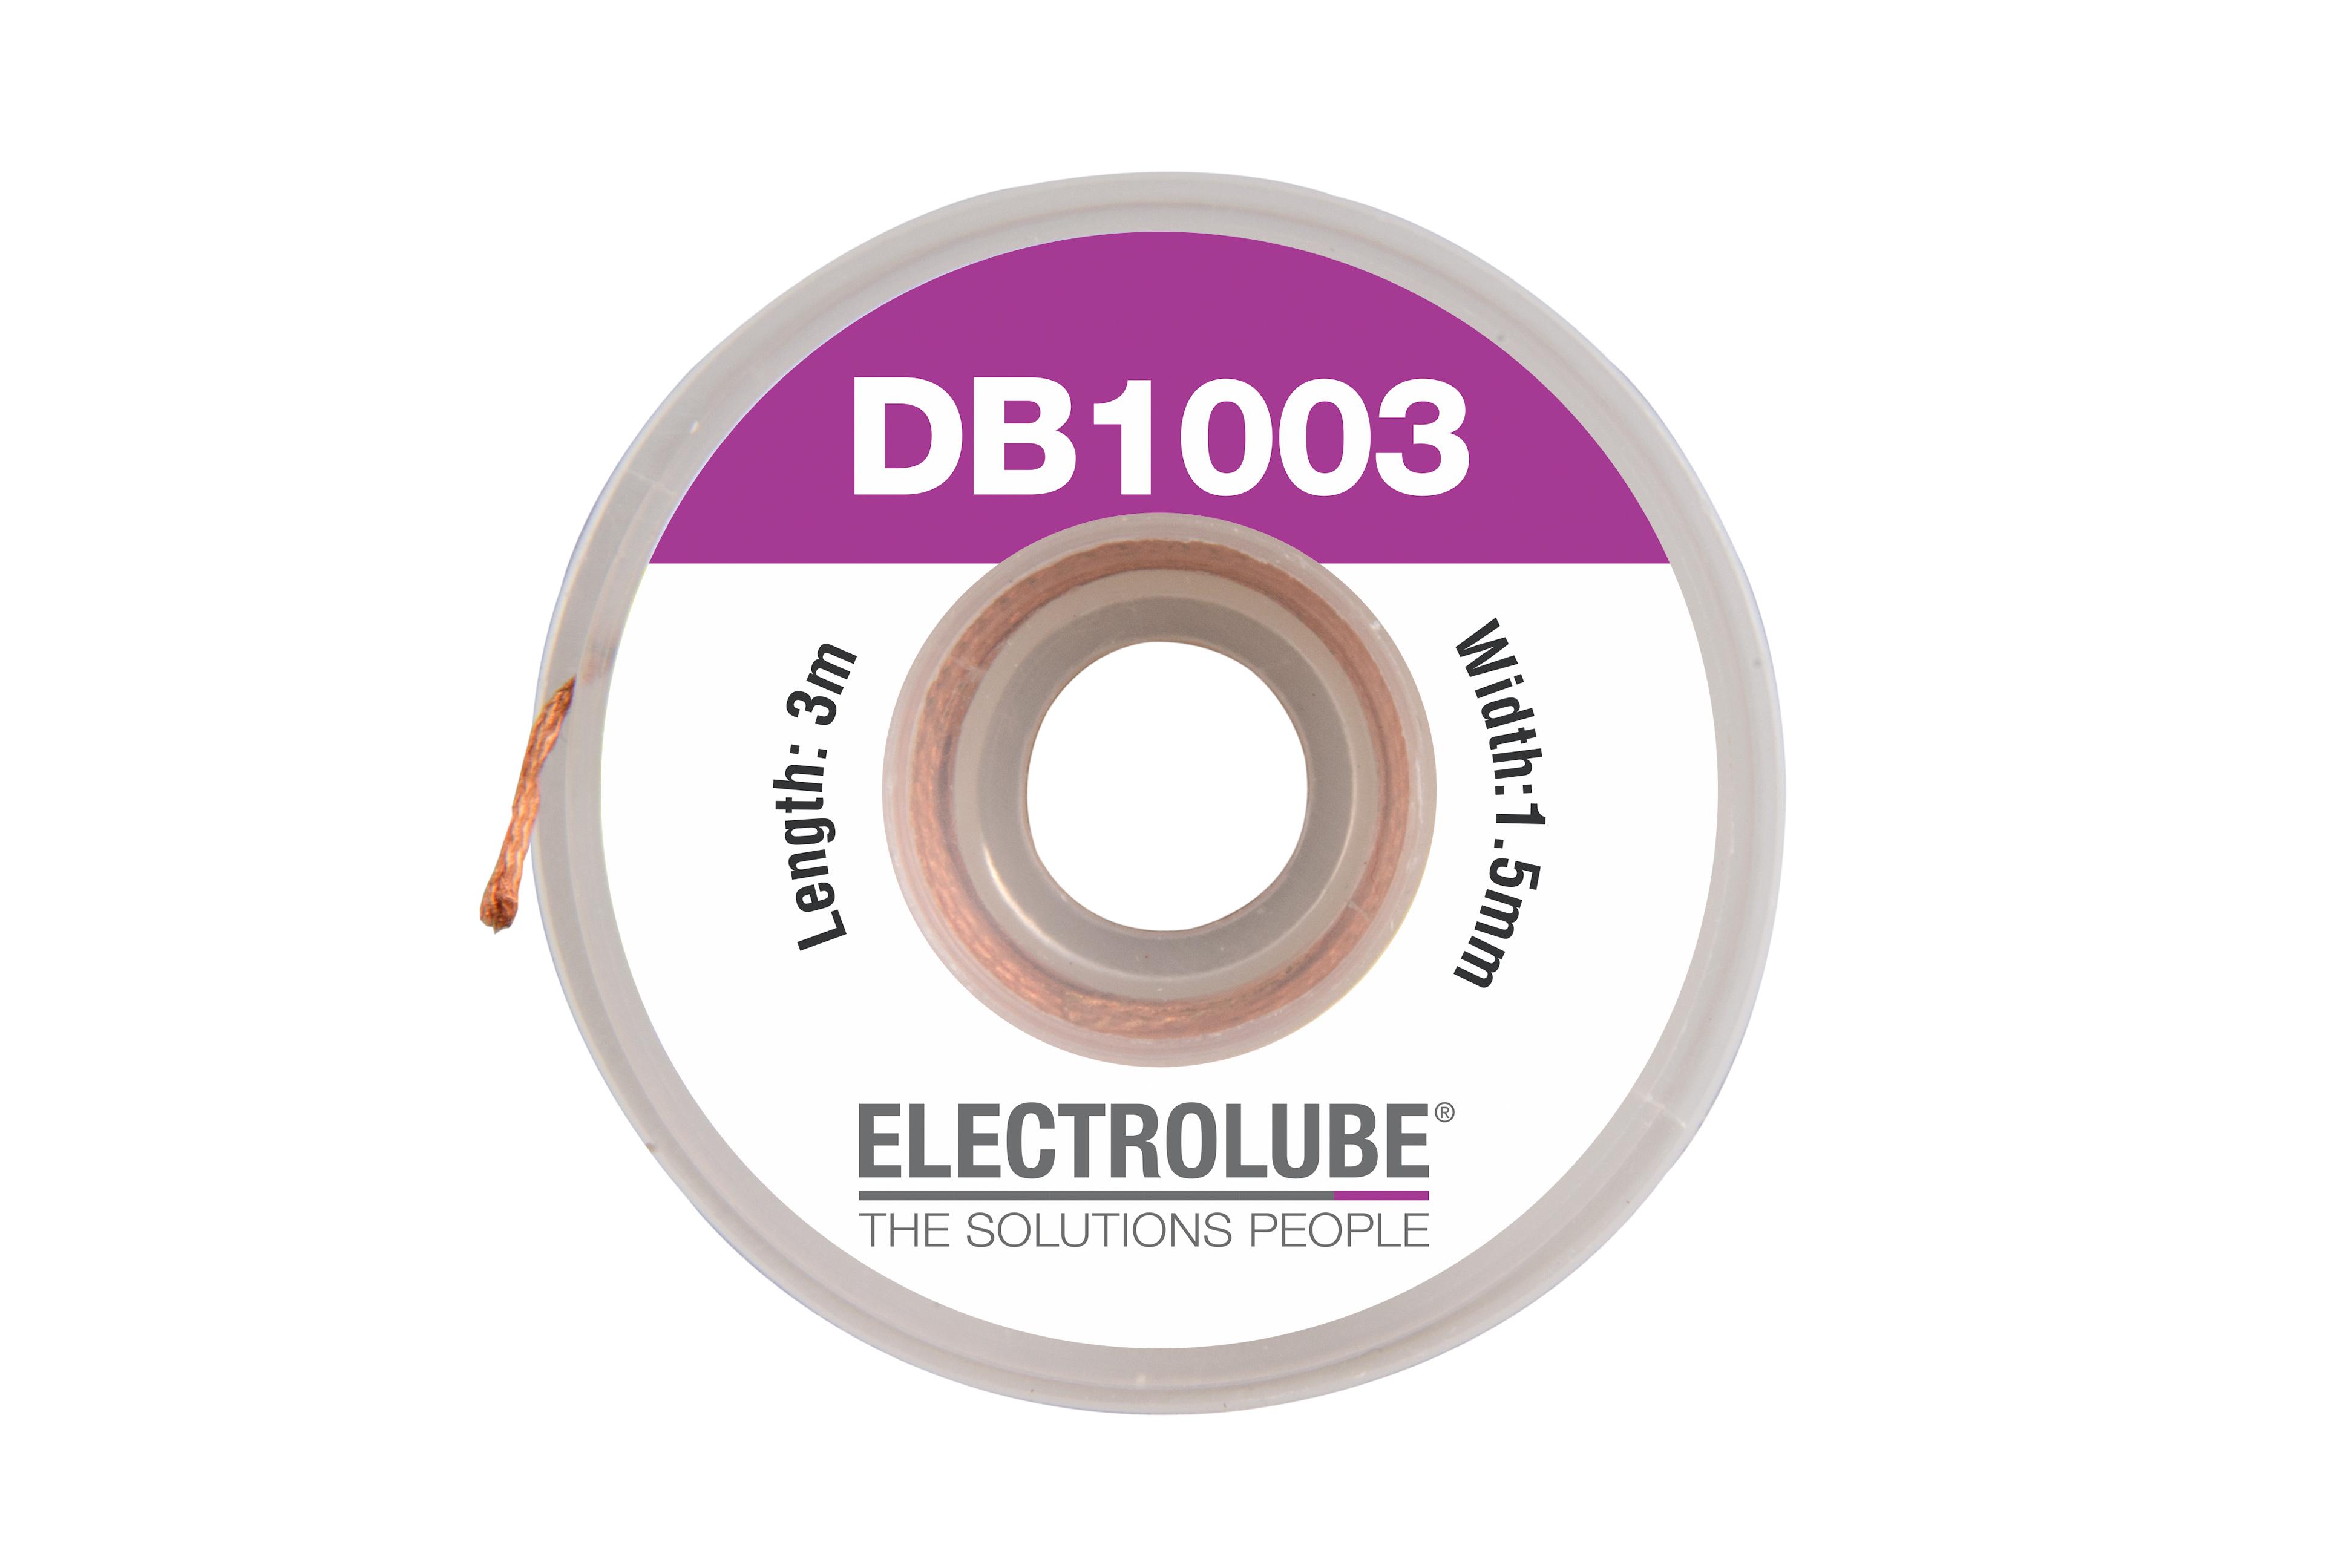 DB2003 Electrolube | DB2003 купить на Symmetron.ru, спецификации, схемы DB2003 Electrolube